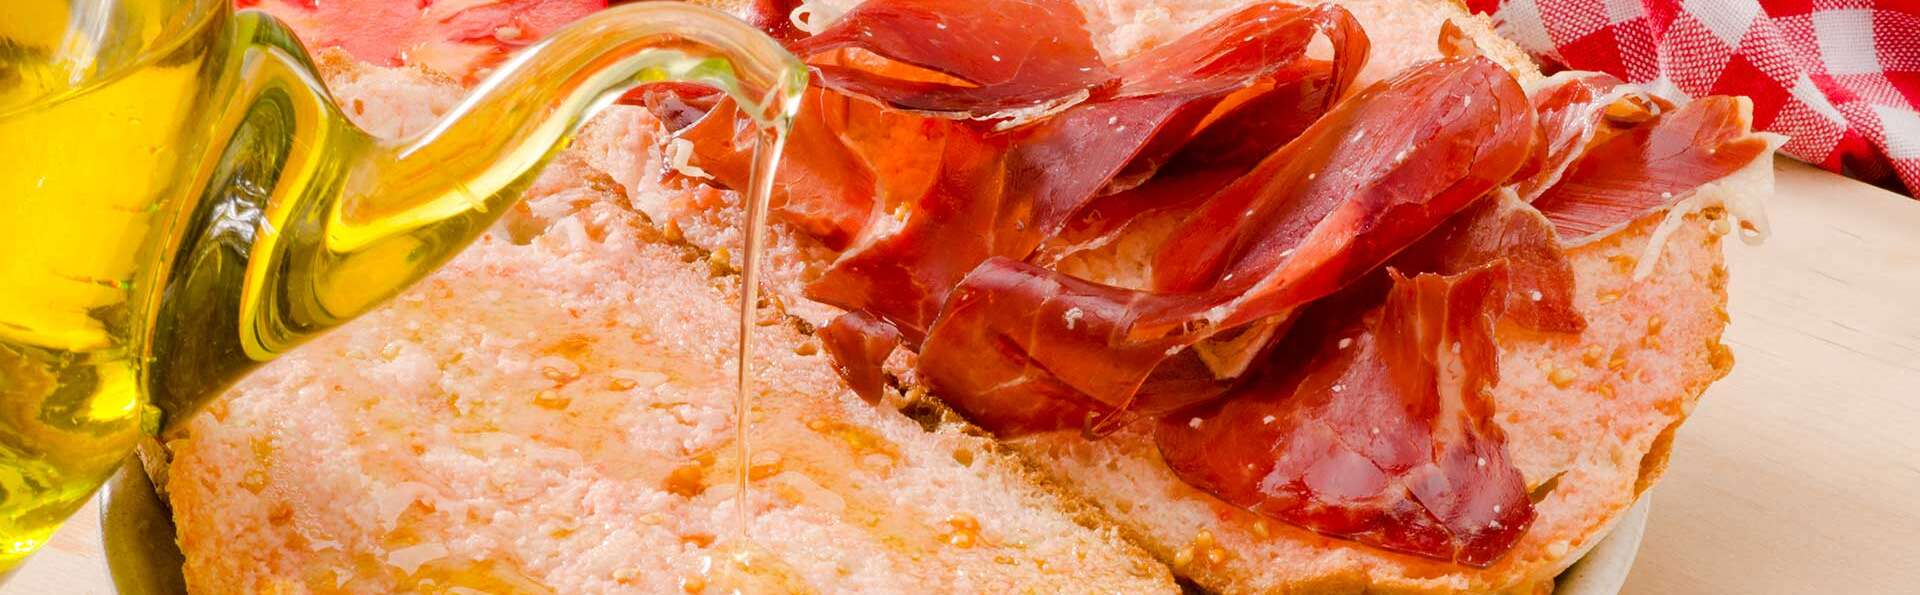 Délices culinaires sur la promenade maritime de Malgrat de Mar